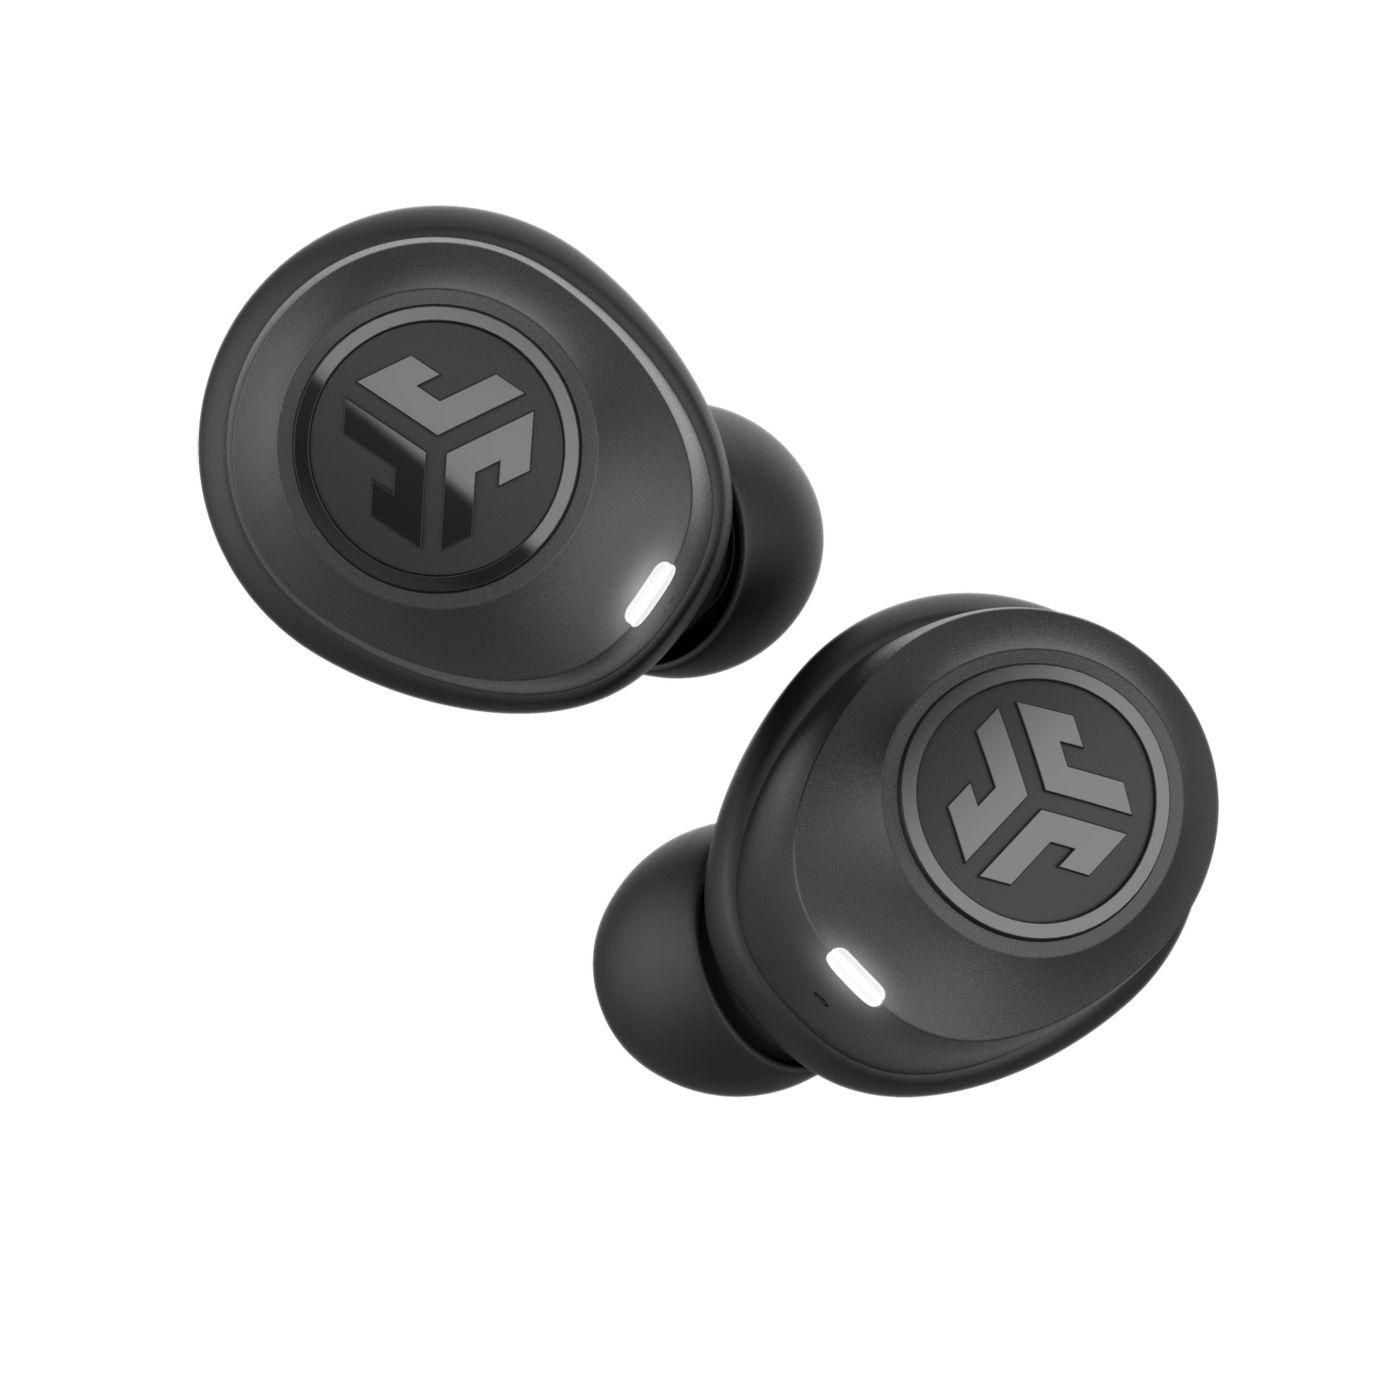 Jlab Audio Jbuds Air True Wireless Earbuds